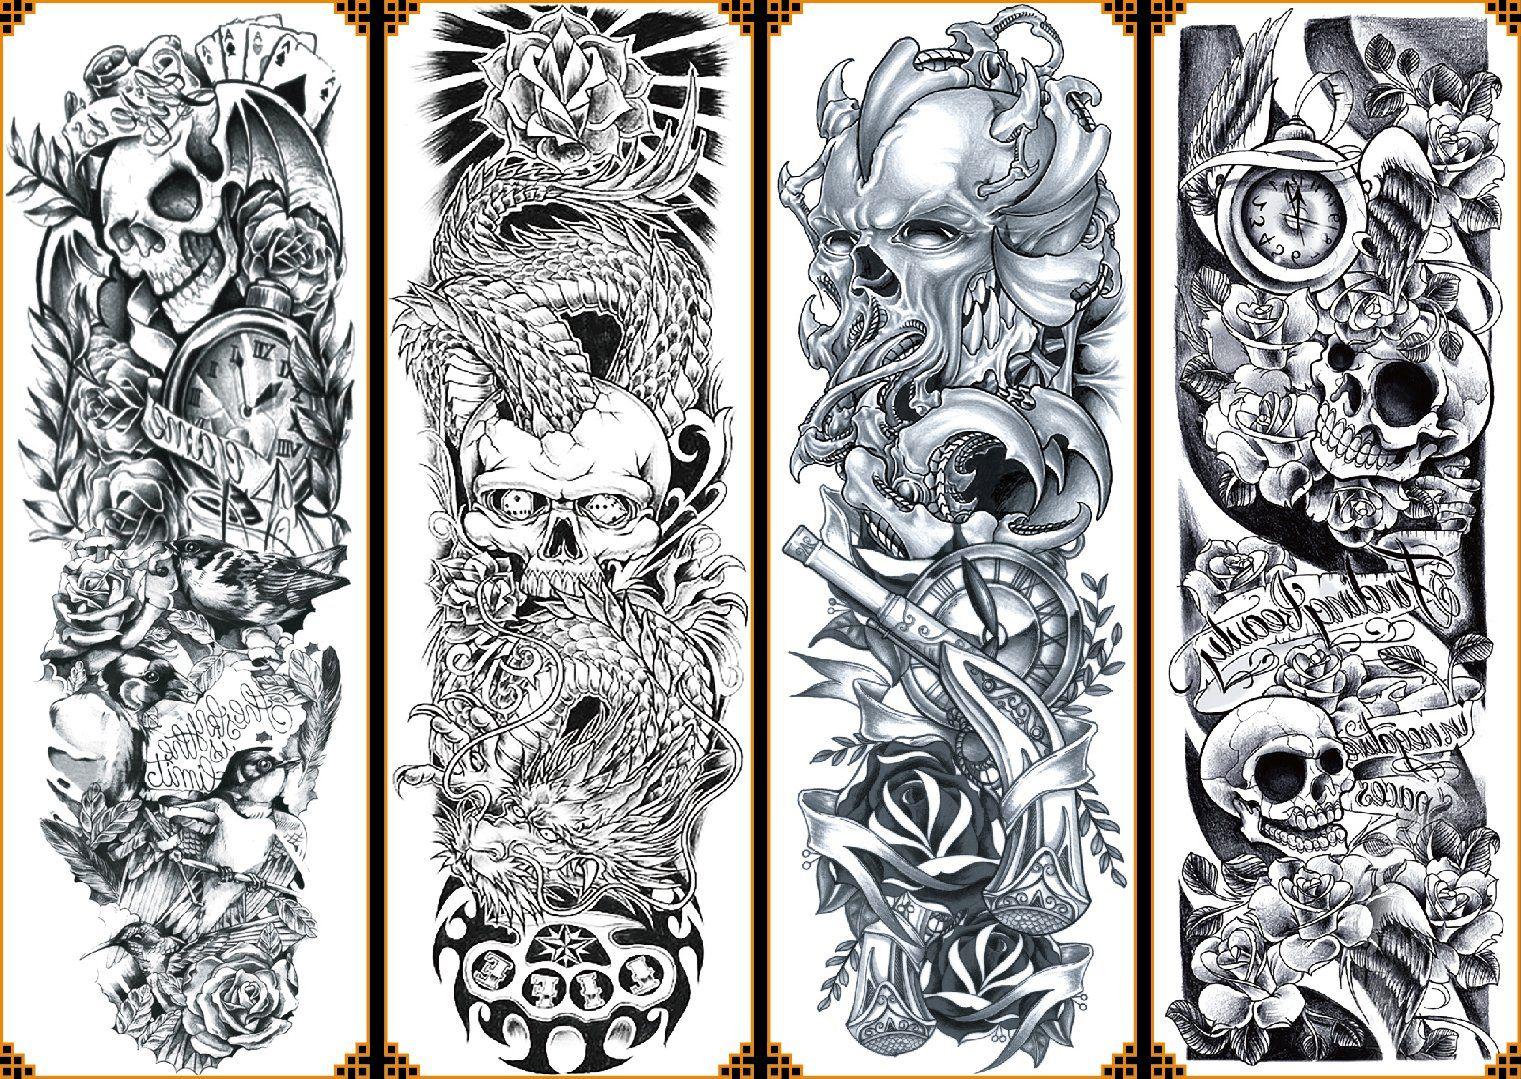 070fc 4sheet Large Temporary Tattoos Big Long Full Arm Tattoo Sticker Unisex Body Art Skull Flower Patt Fake Tattoo Sleeves Full Arm Tattoos Arm Sleeve Tattoos